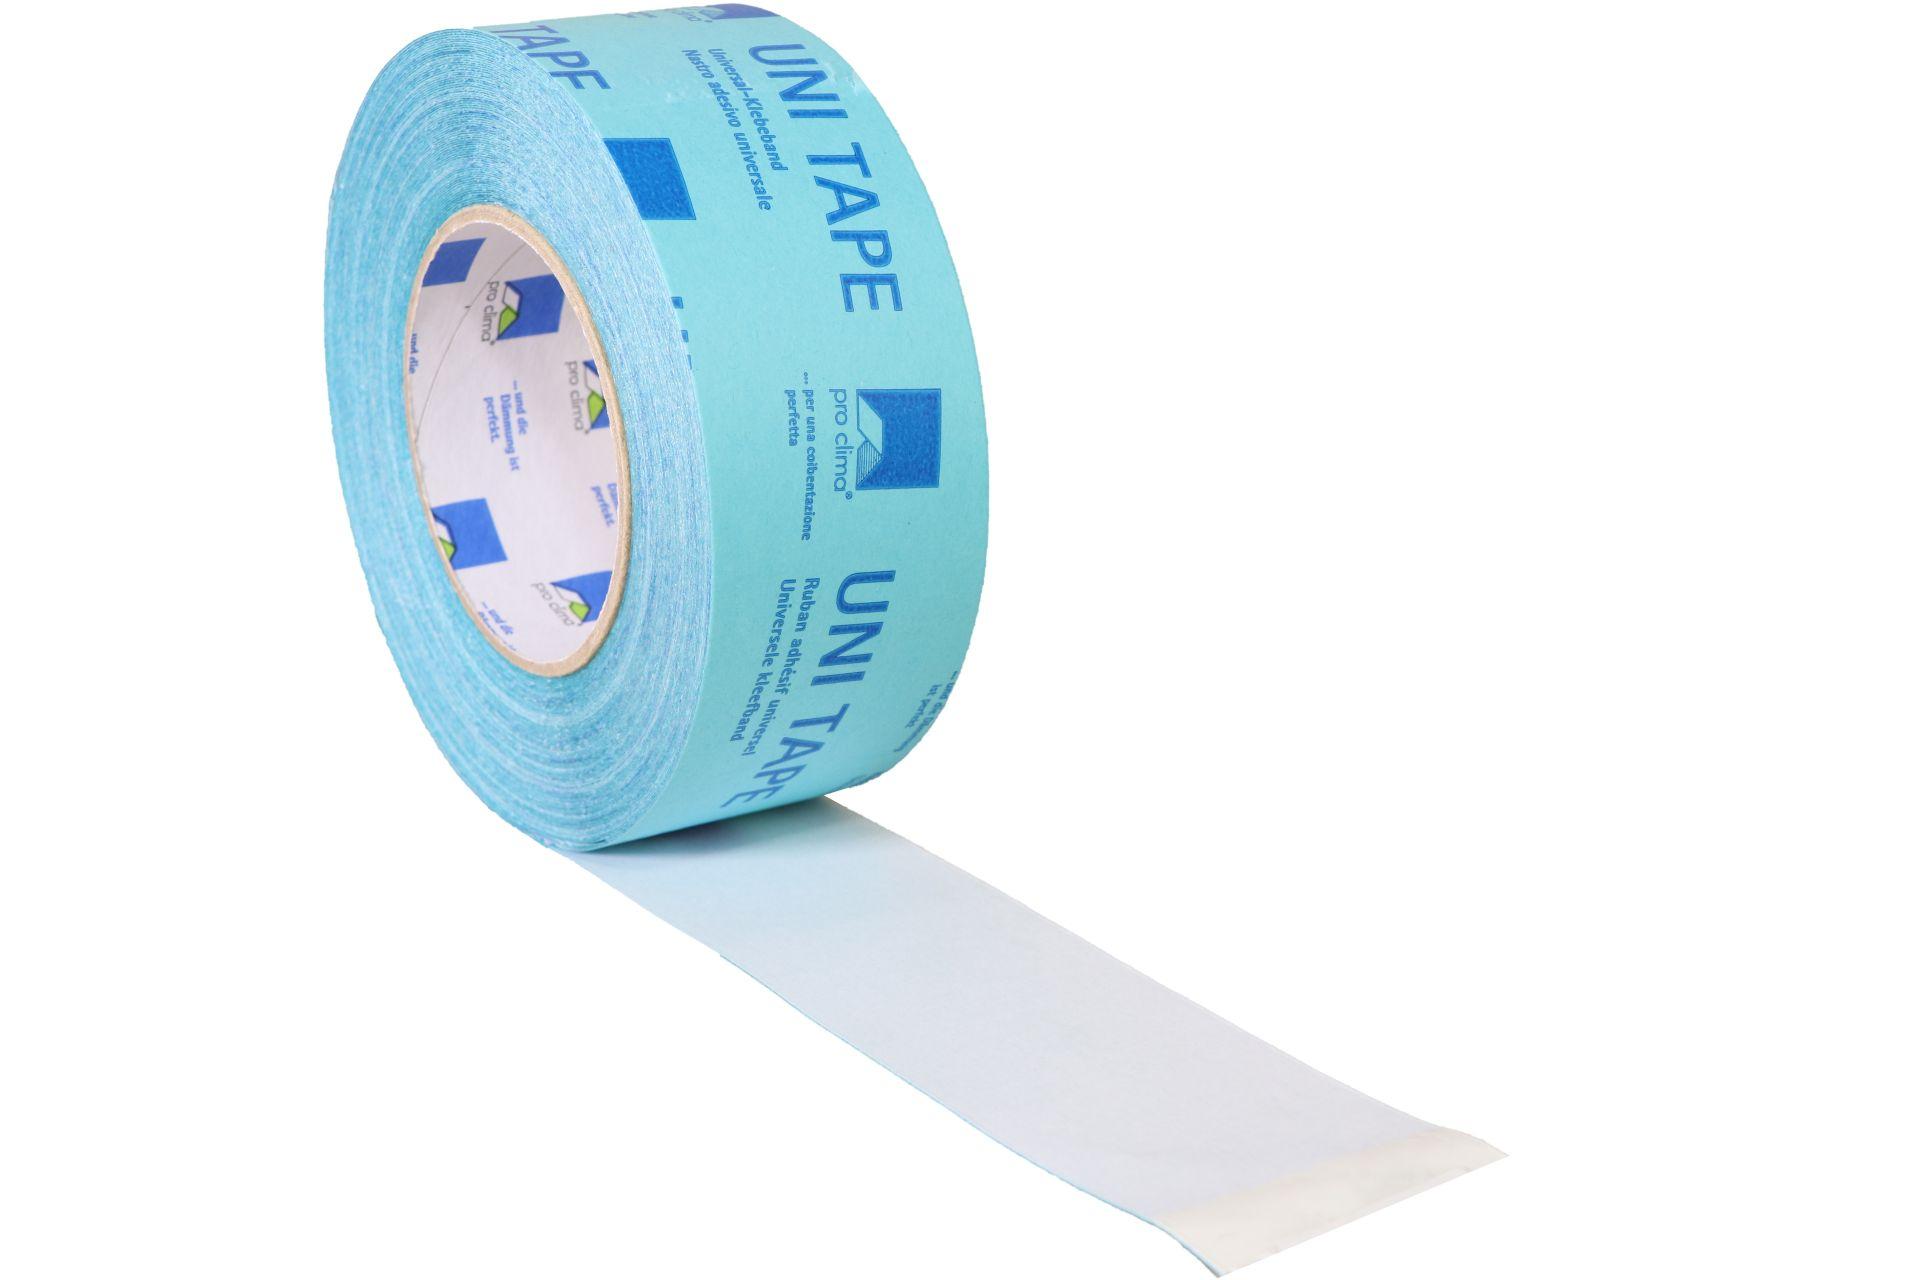 pro clima UNI TAPE Universal-Klebeband, 60 mm breit, 30 m Rolle, blau